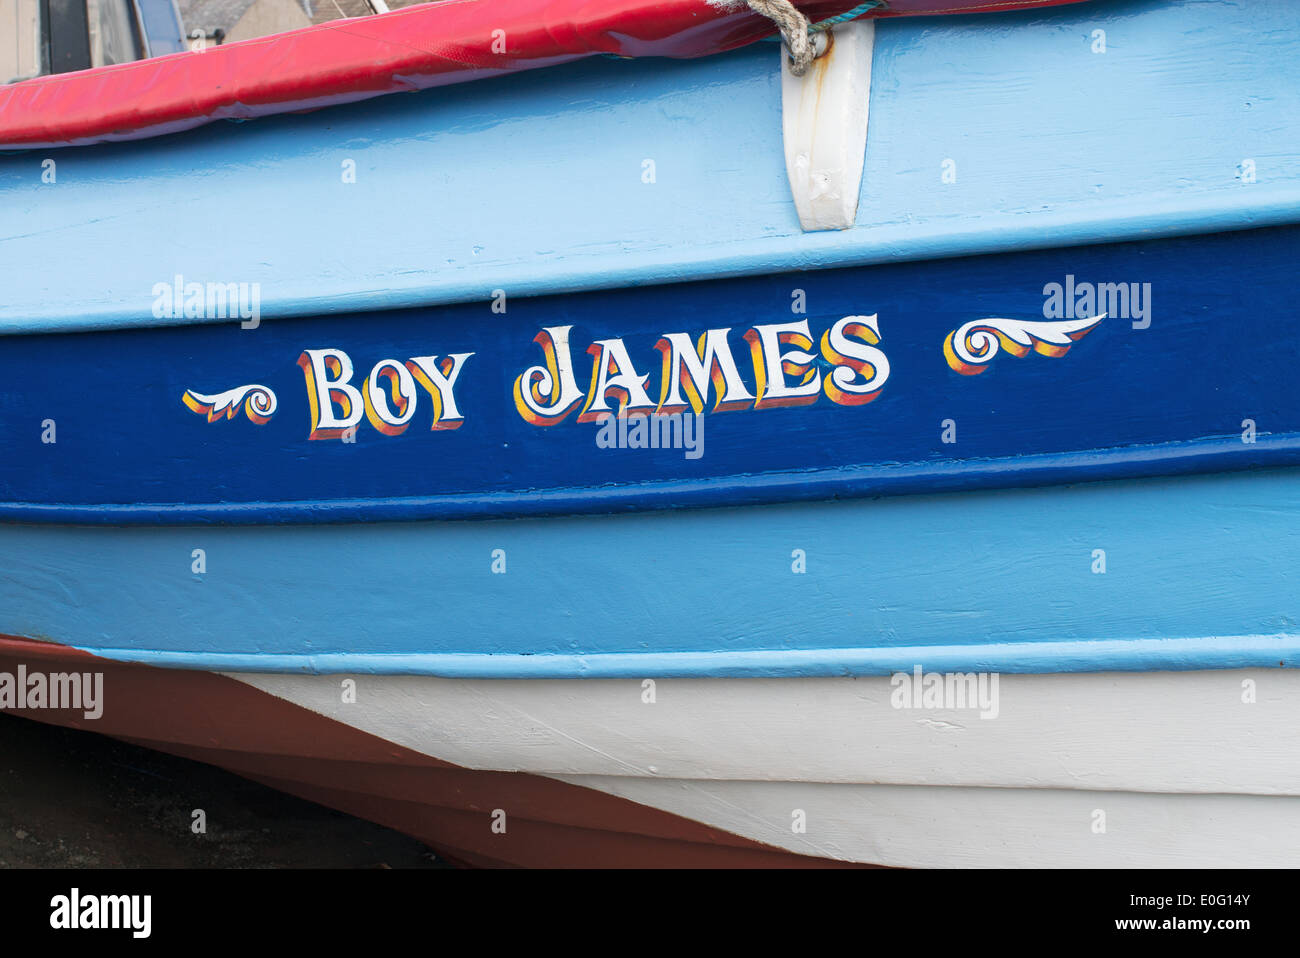 Fishing Boat Name Boy James North East England UK